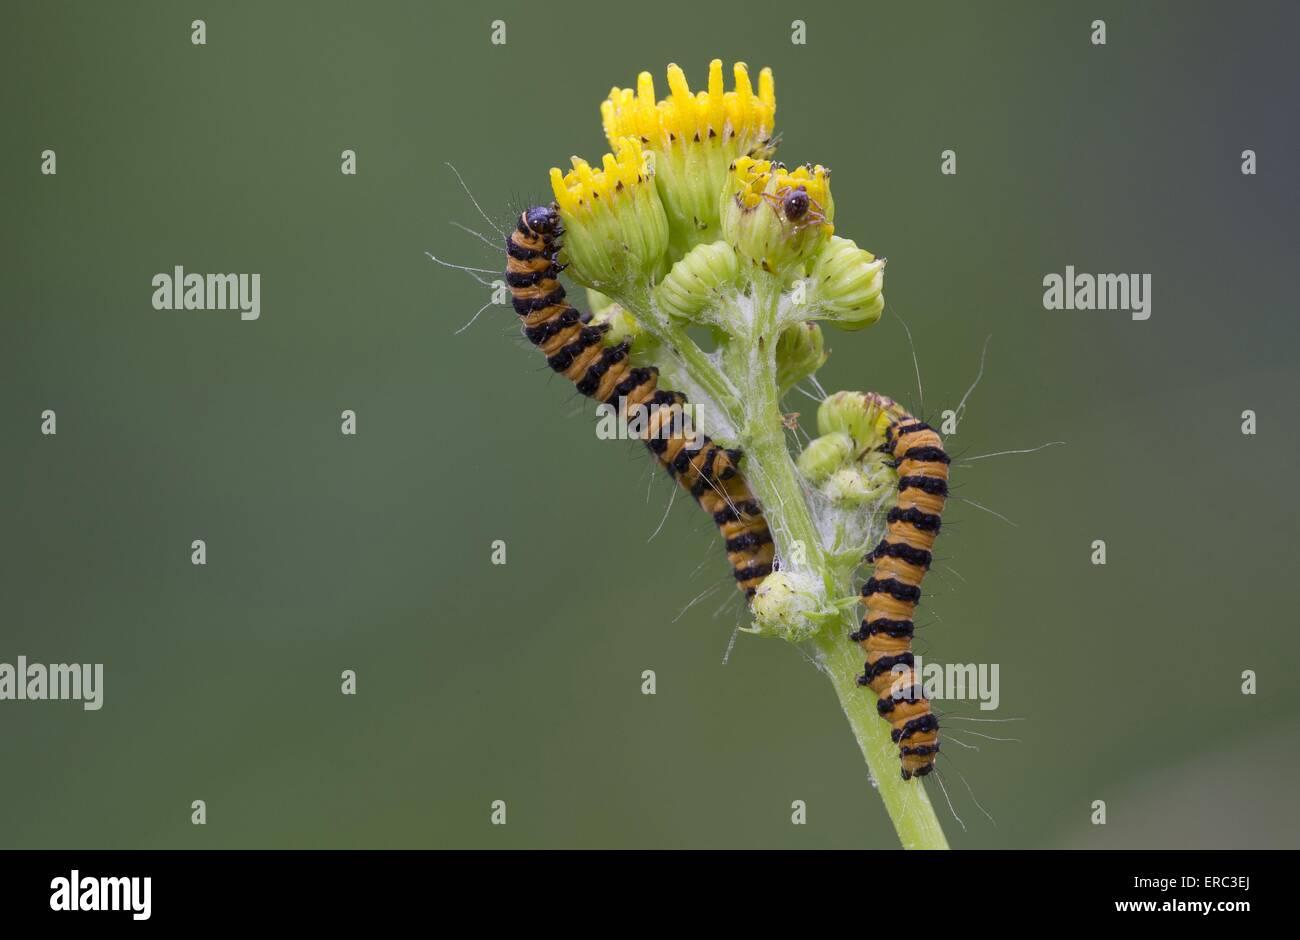 cinnabar moth grubs - Stock Image